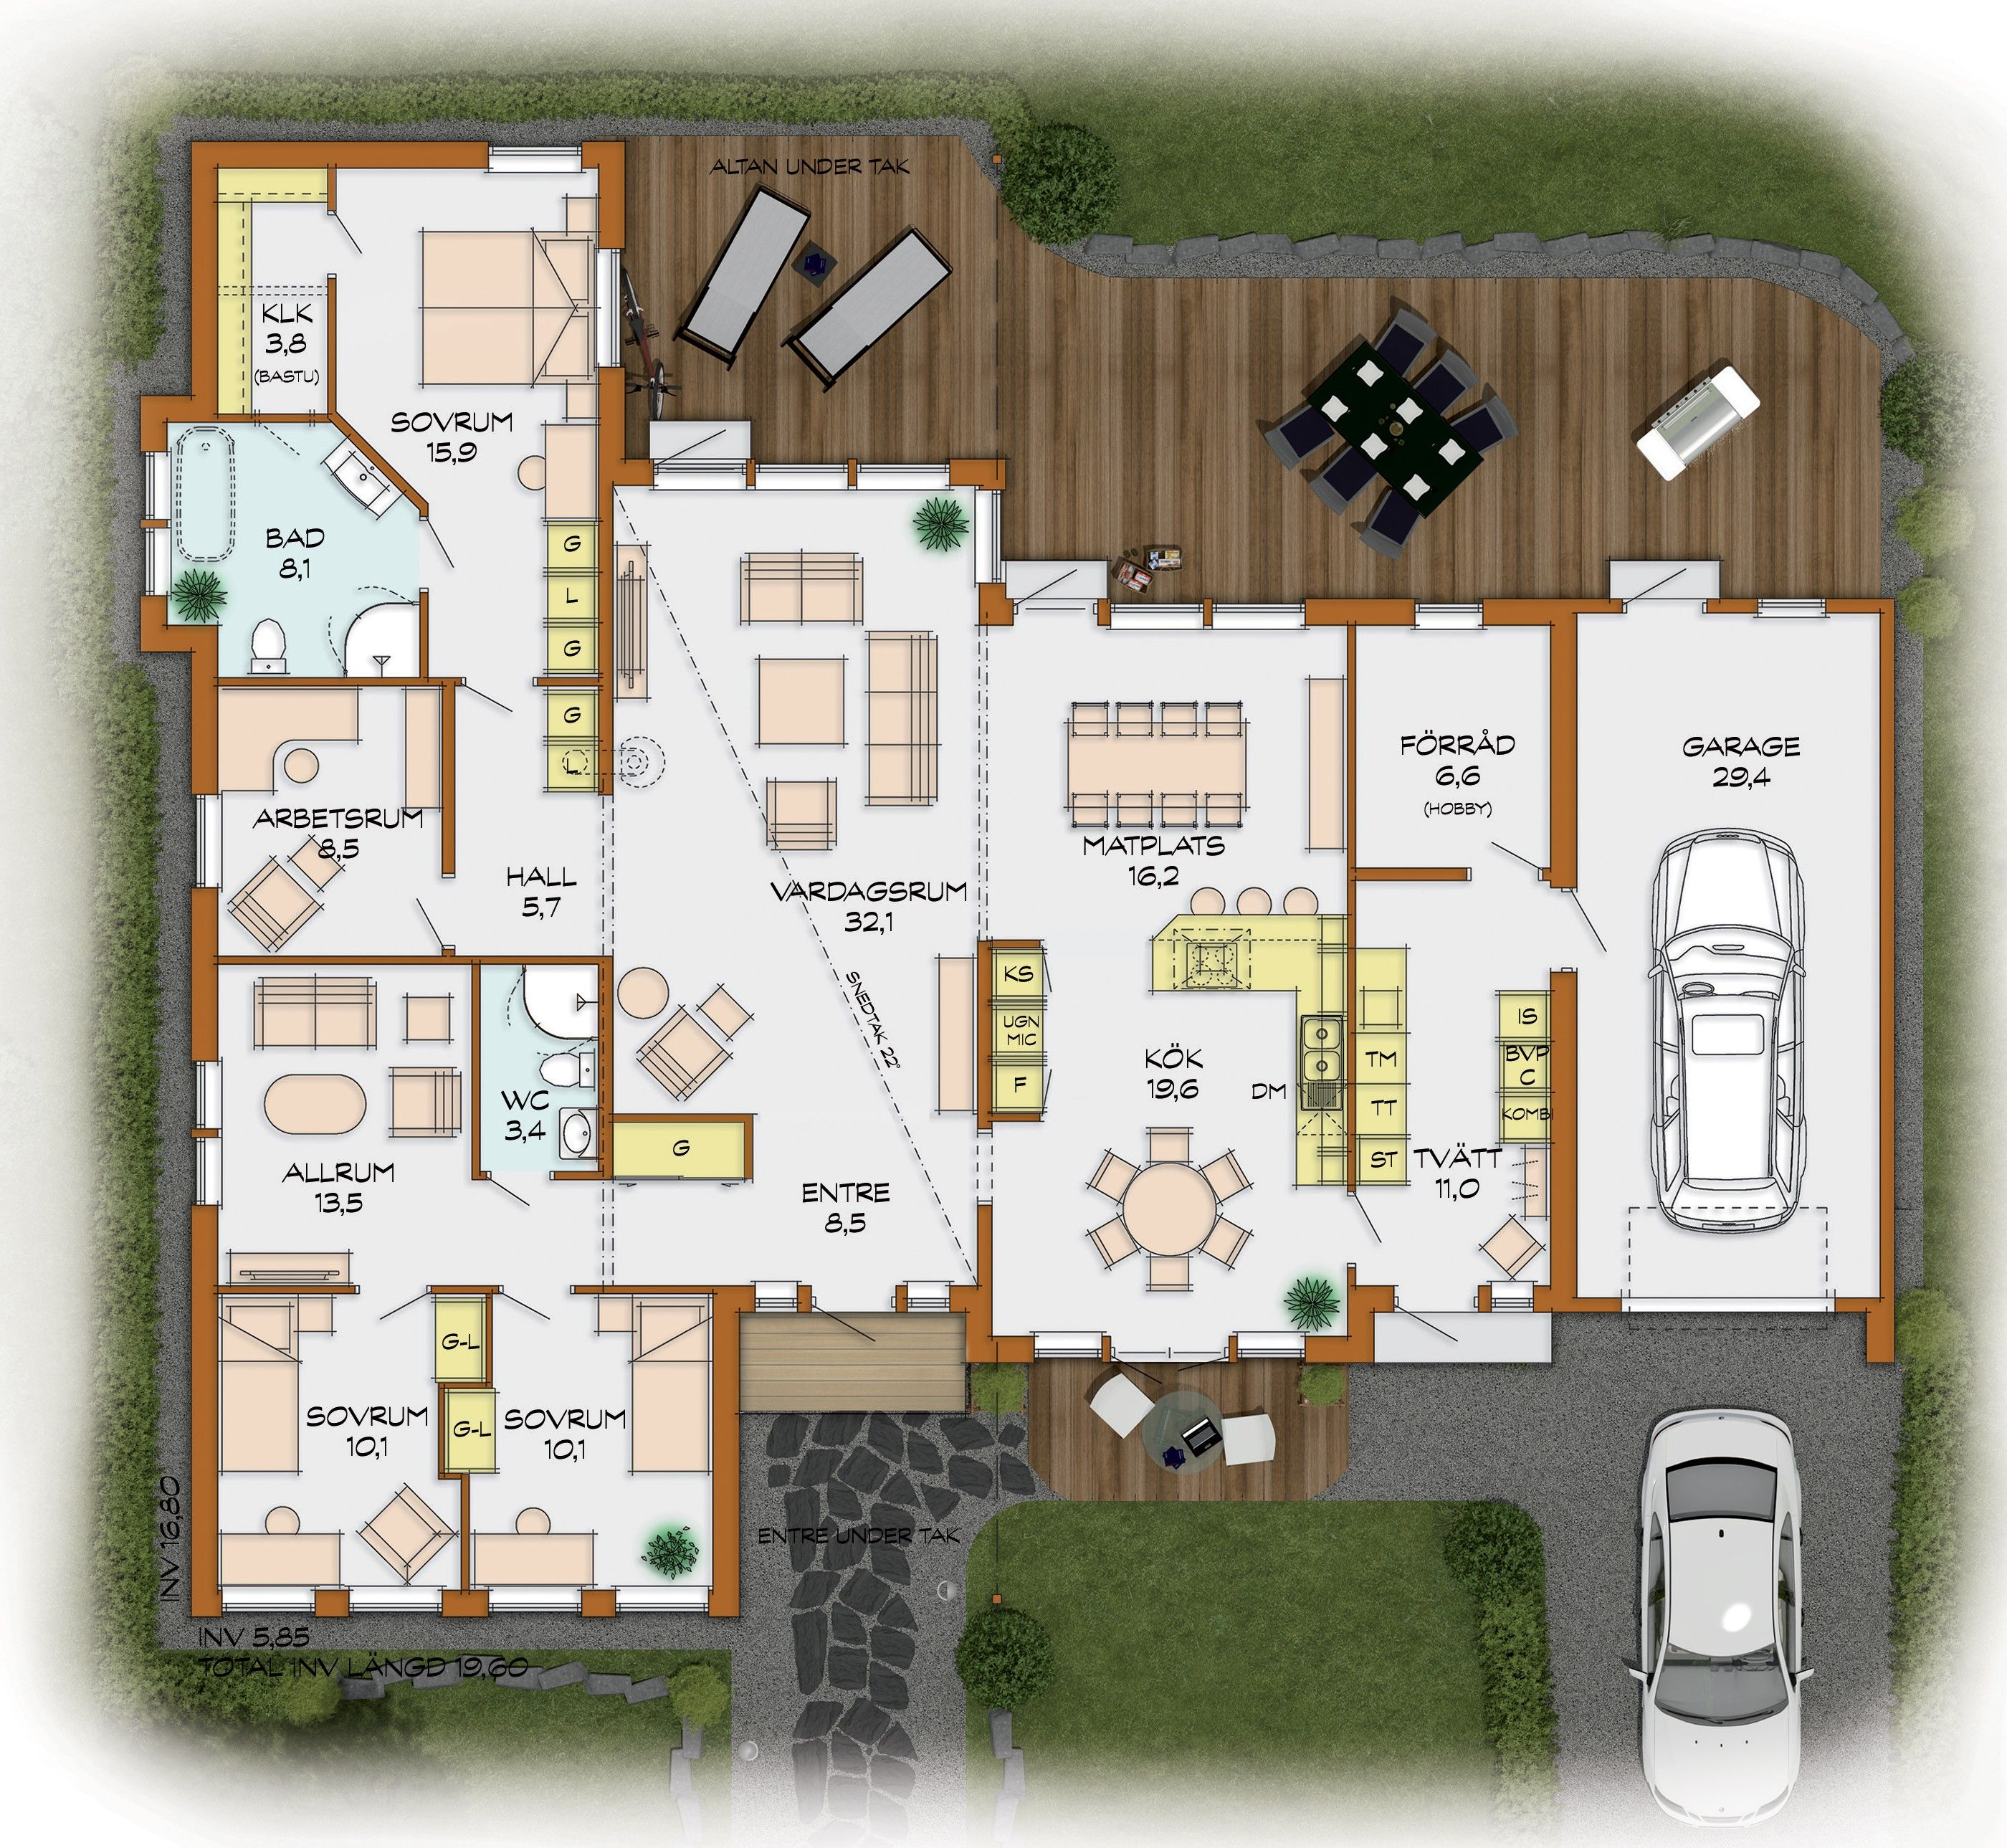 Grundriss Haus 6 Schlafzimmer Neues Weltdesign 2018 Avec